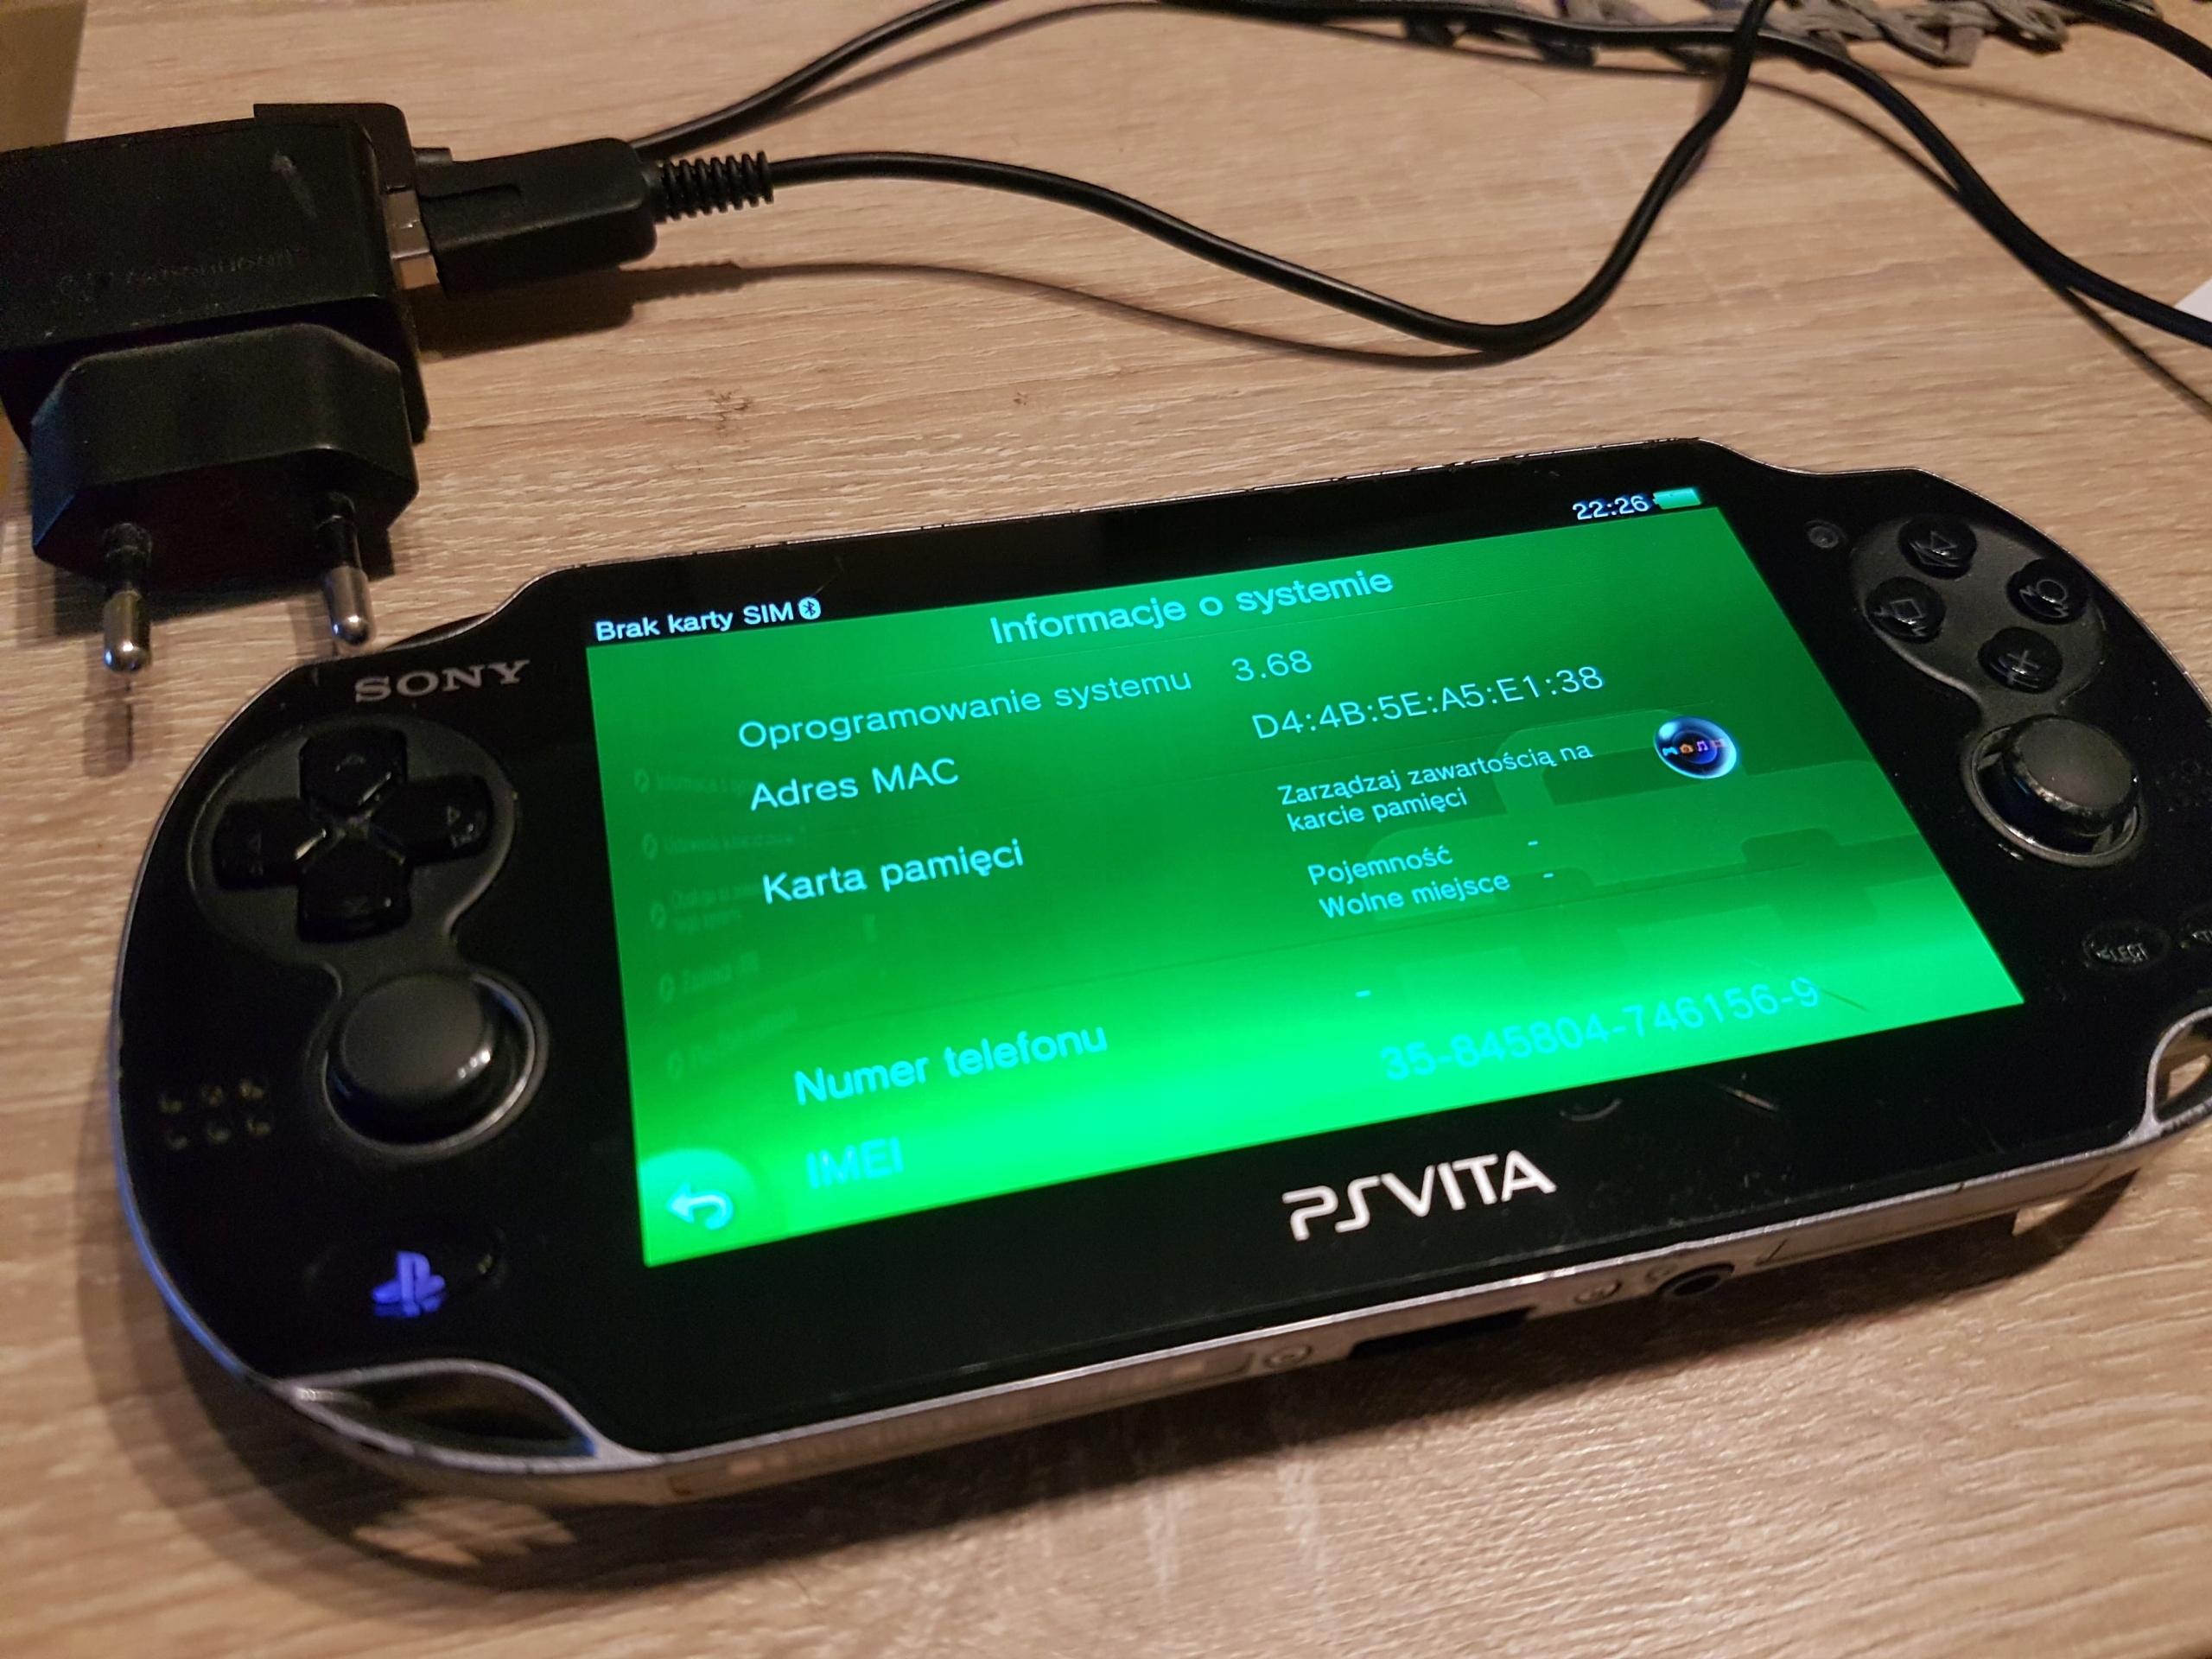 PS VITA 3.68 3G WIFI MODEL PCH 1103 UNIKAT HENKAKU